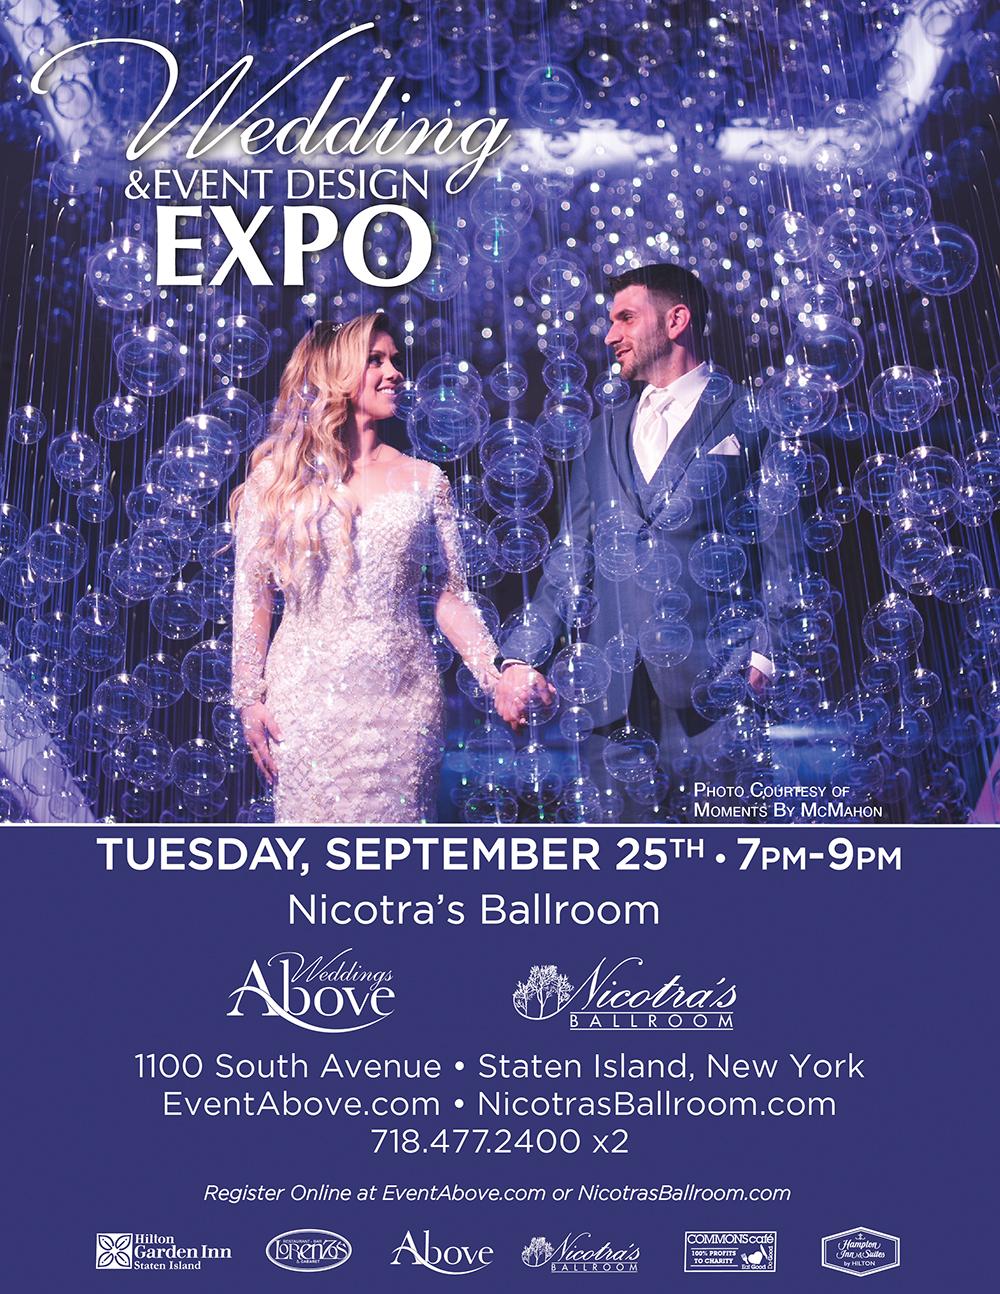 Wedding and Event Designe Expo Flyer